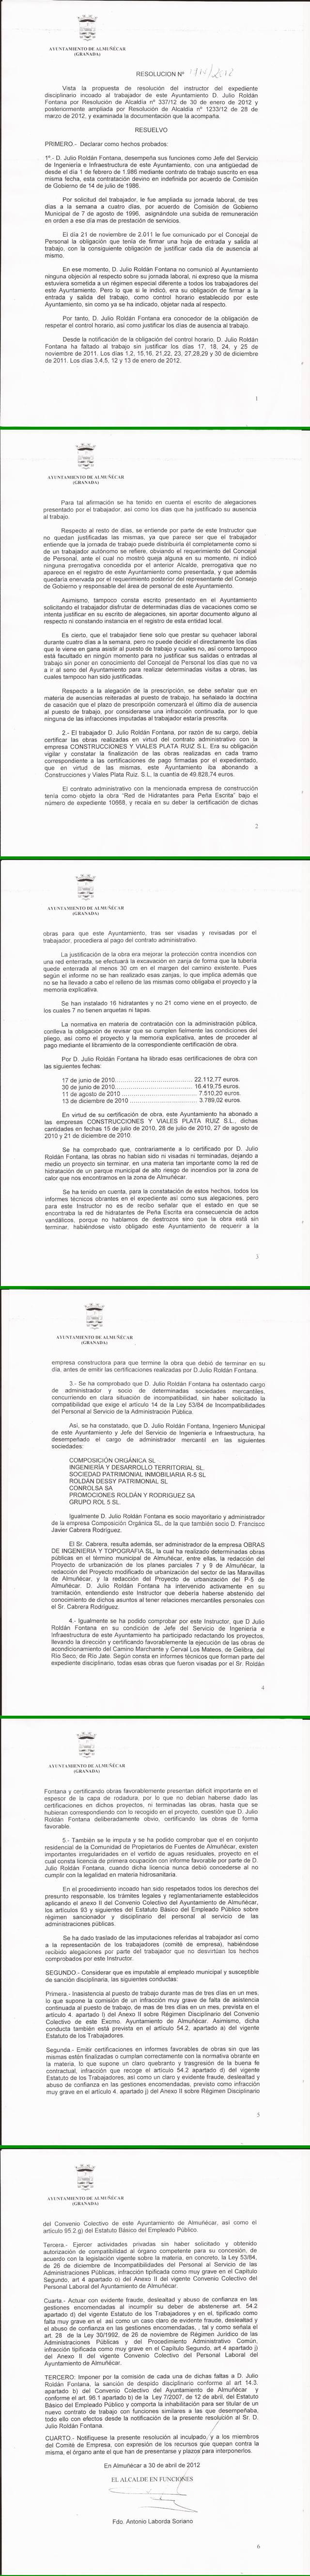 20120503180656-despido-disciplinario-j-vert.jpg